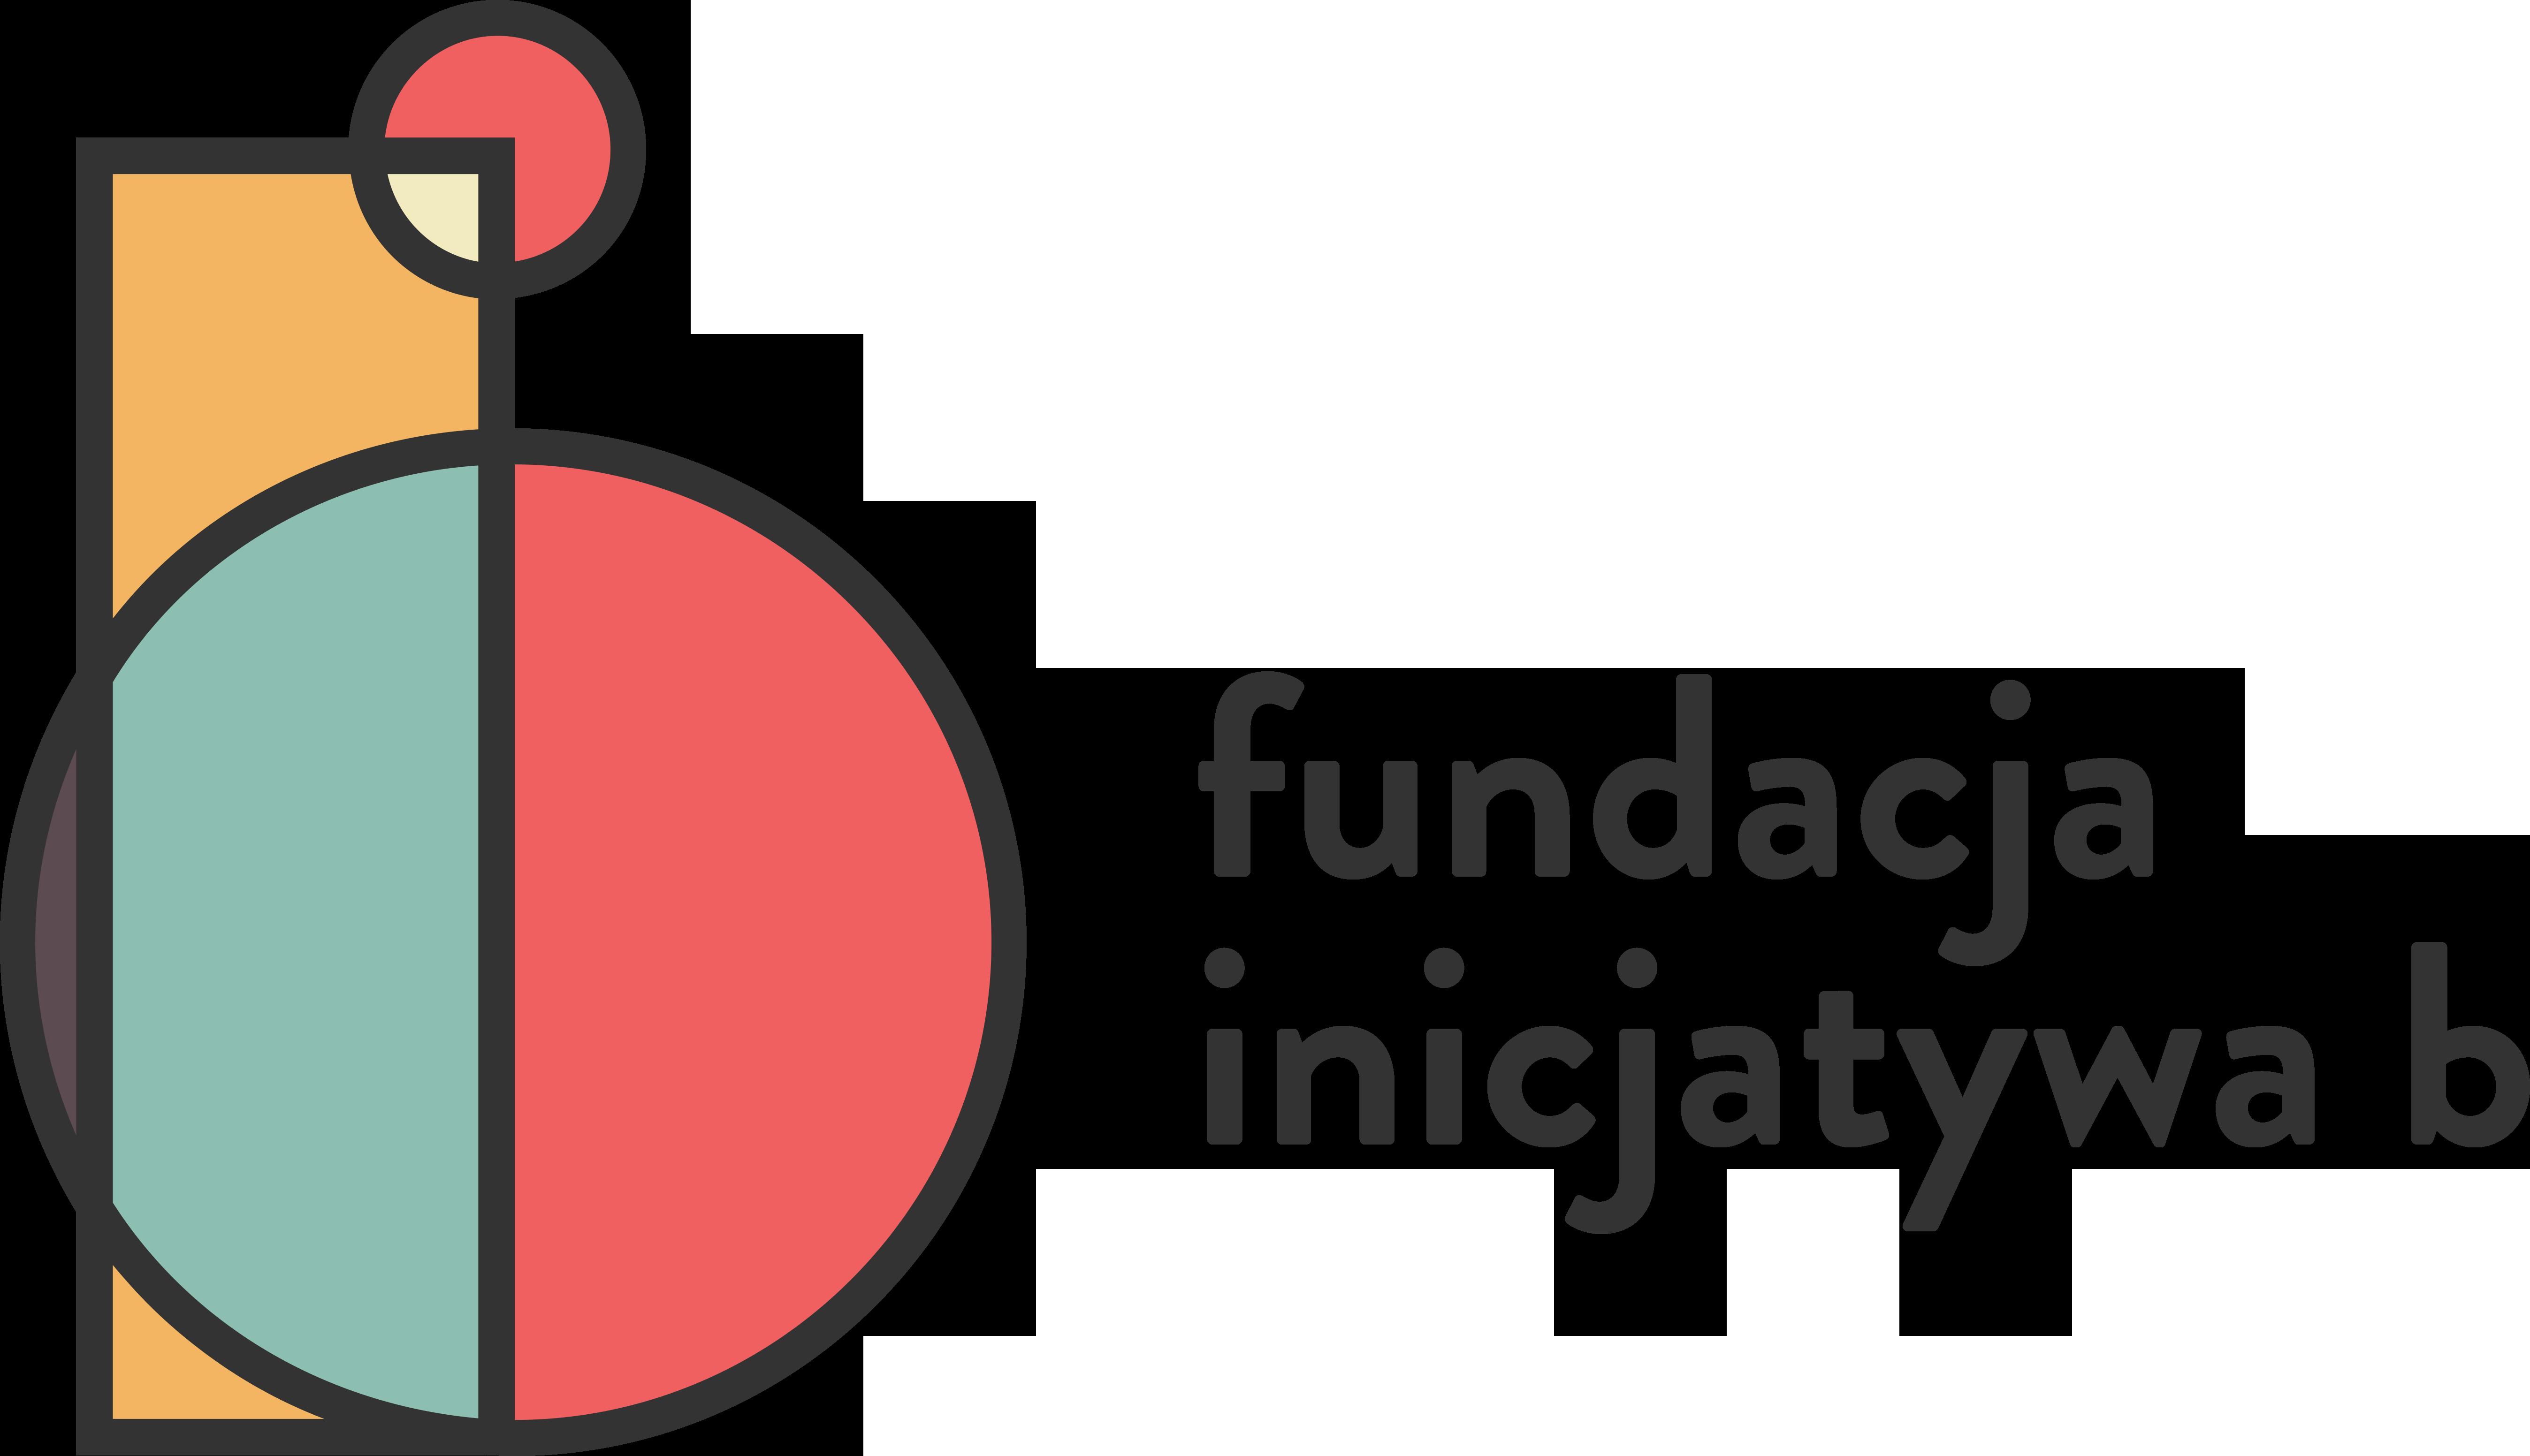 Fundacja Inicjatywa B